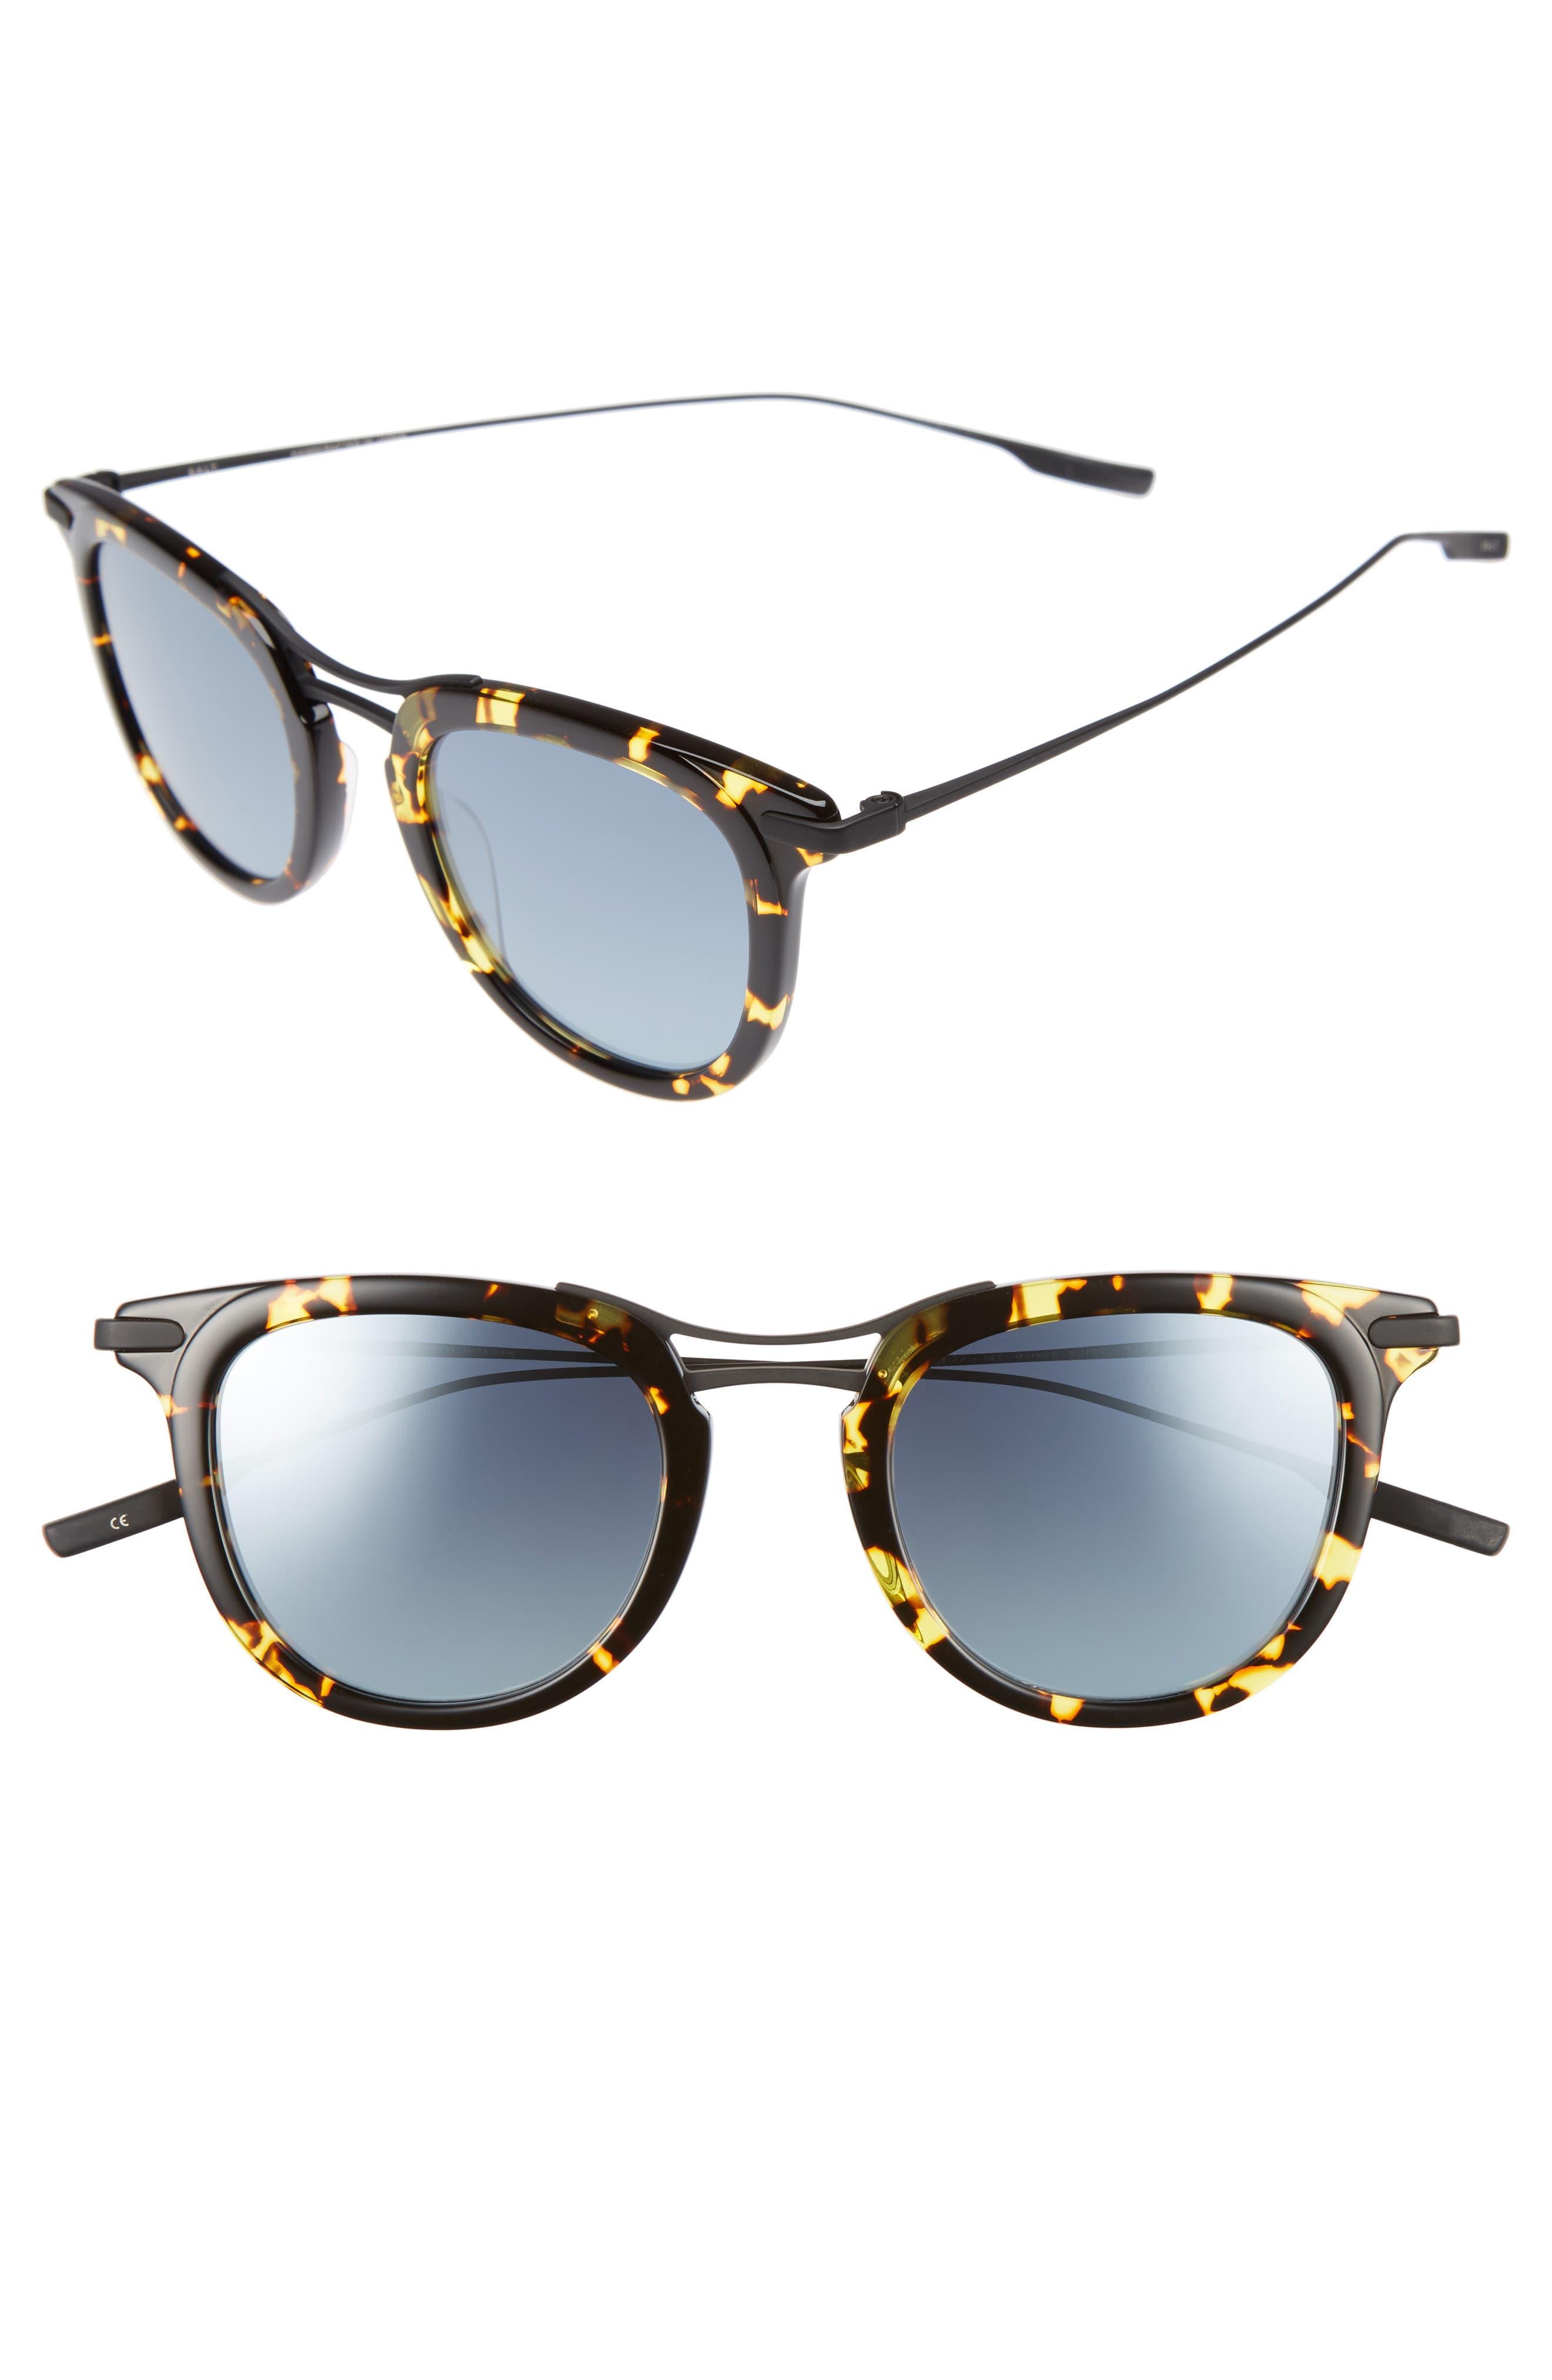 Main Image - SALT Raines 47mm Polarized Sunglasses